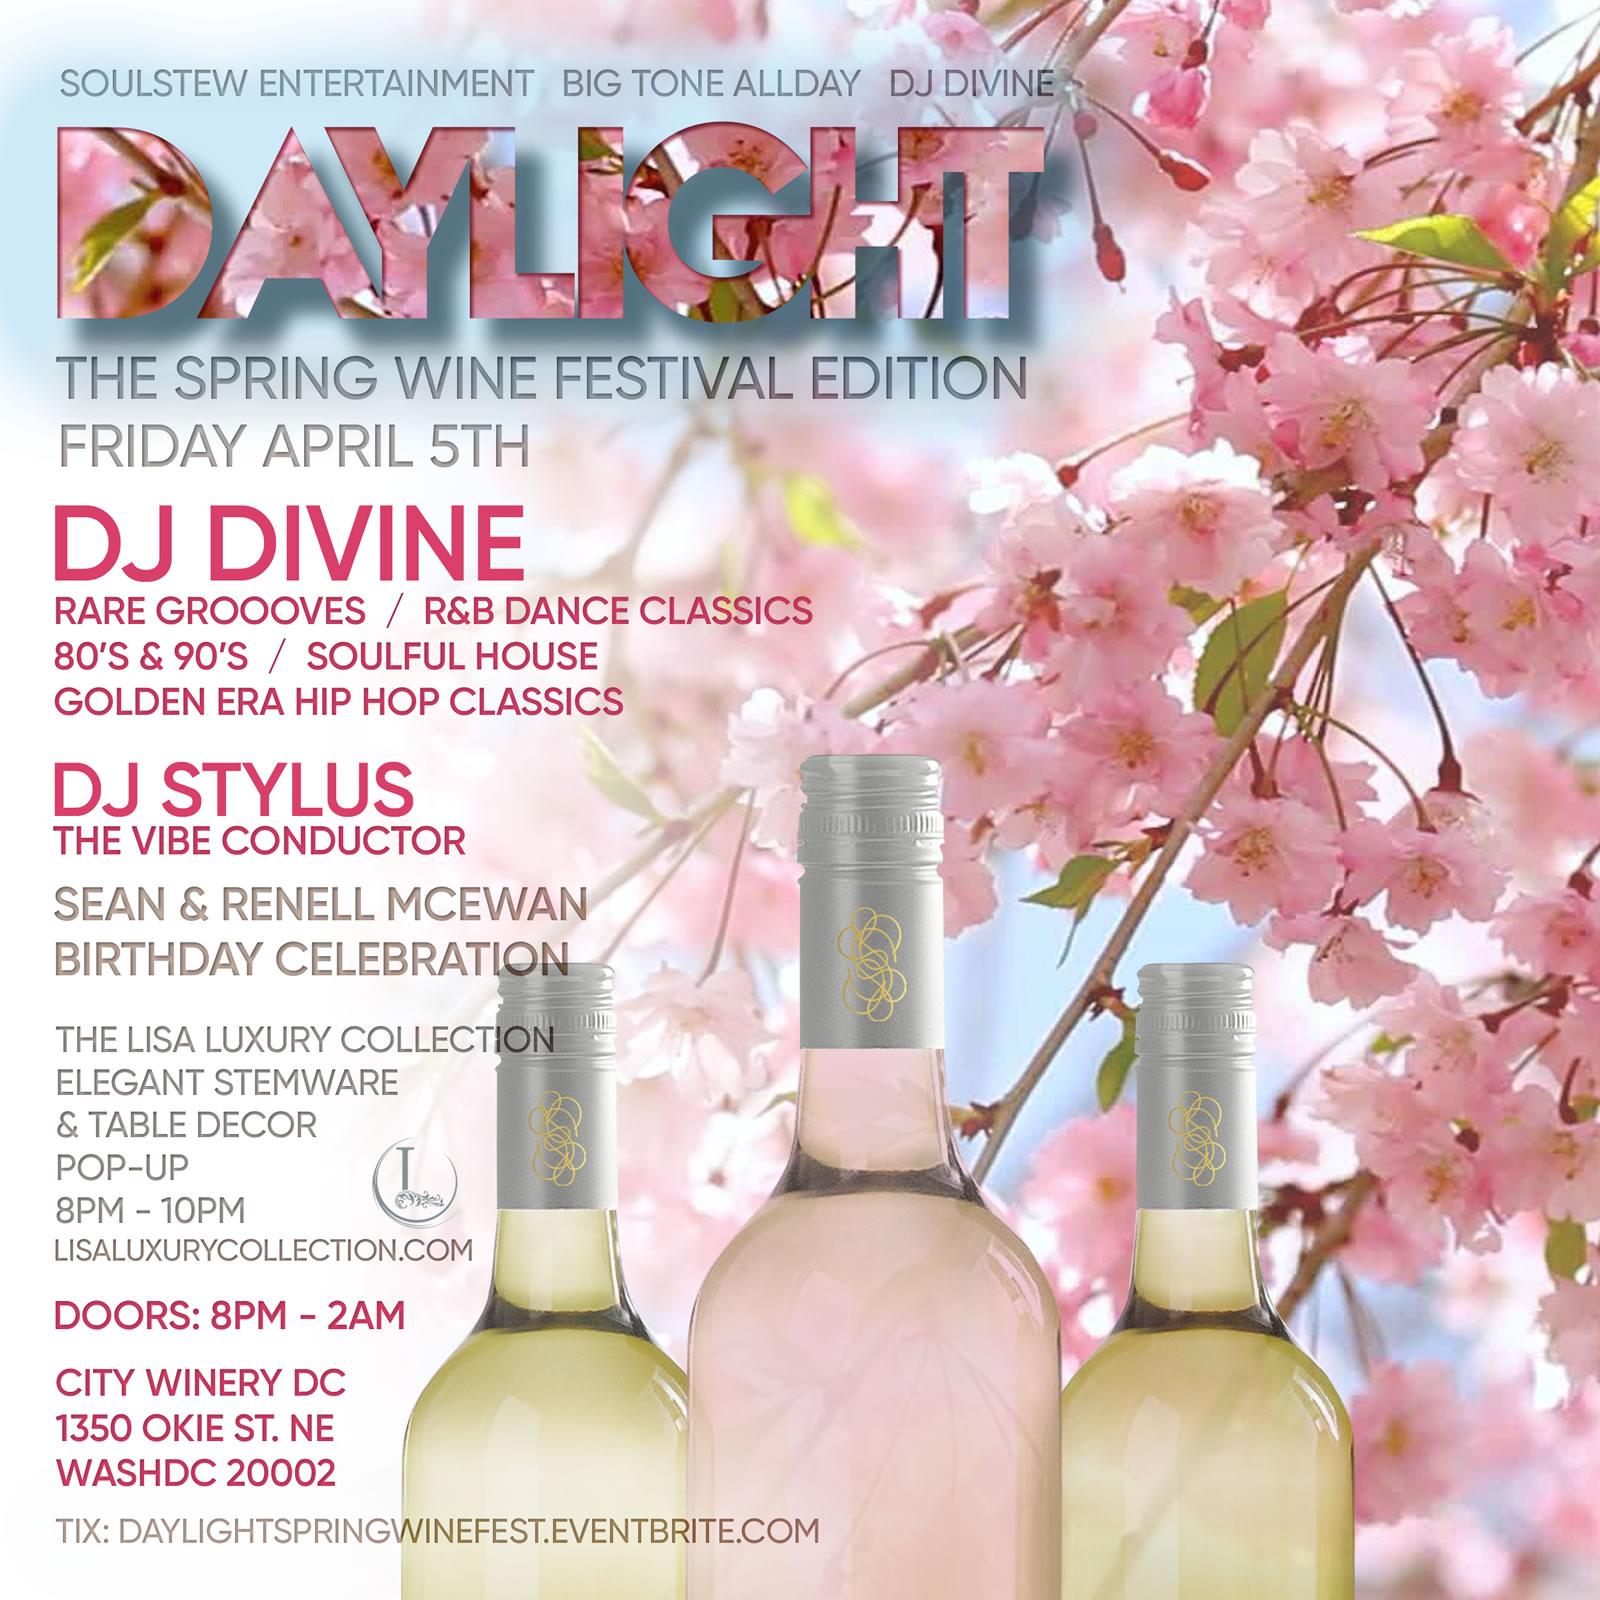 Daylight Spring Wine Flight Fest, Fri. 4/5